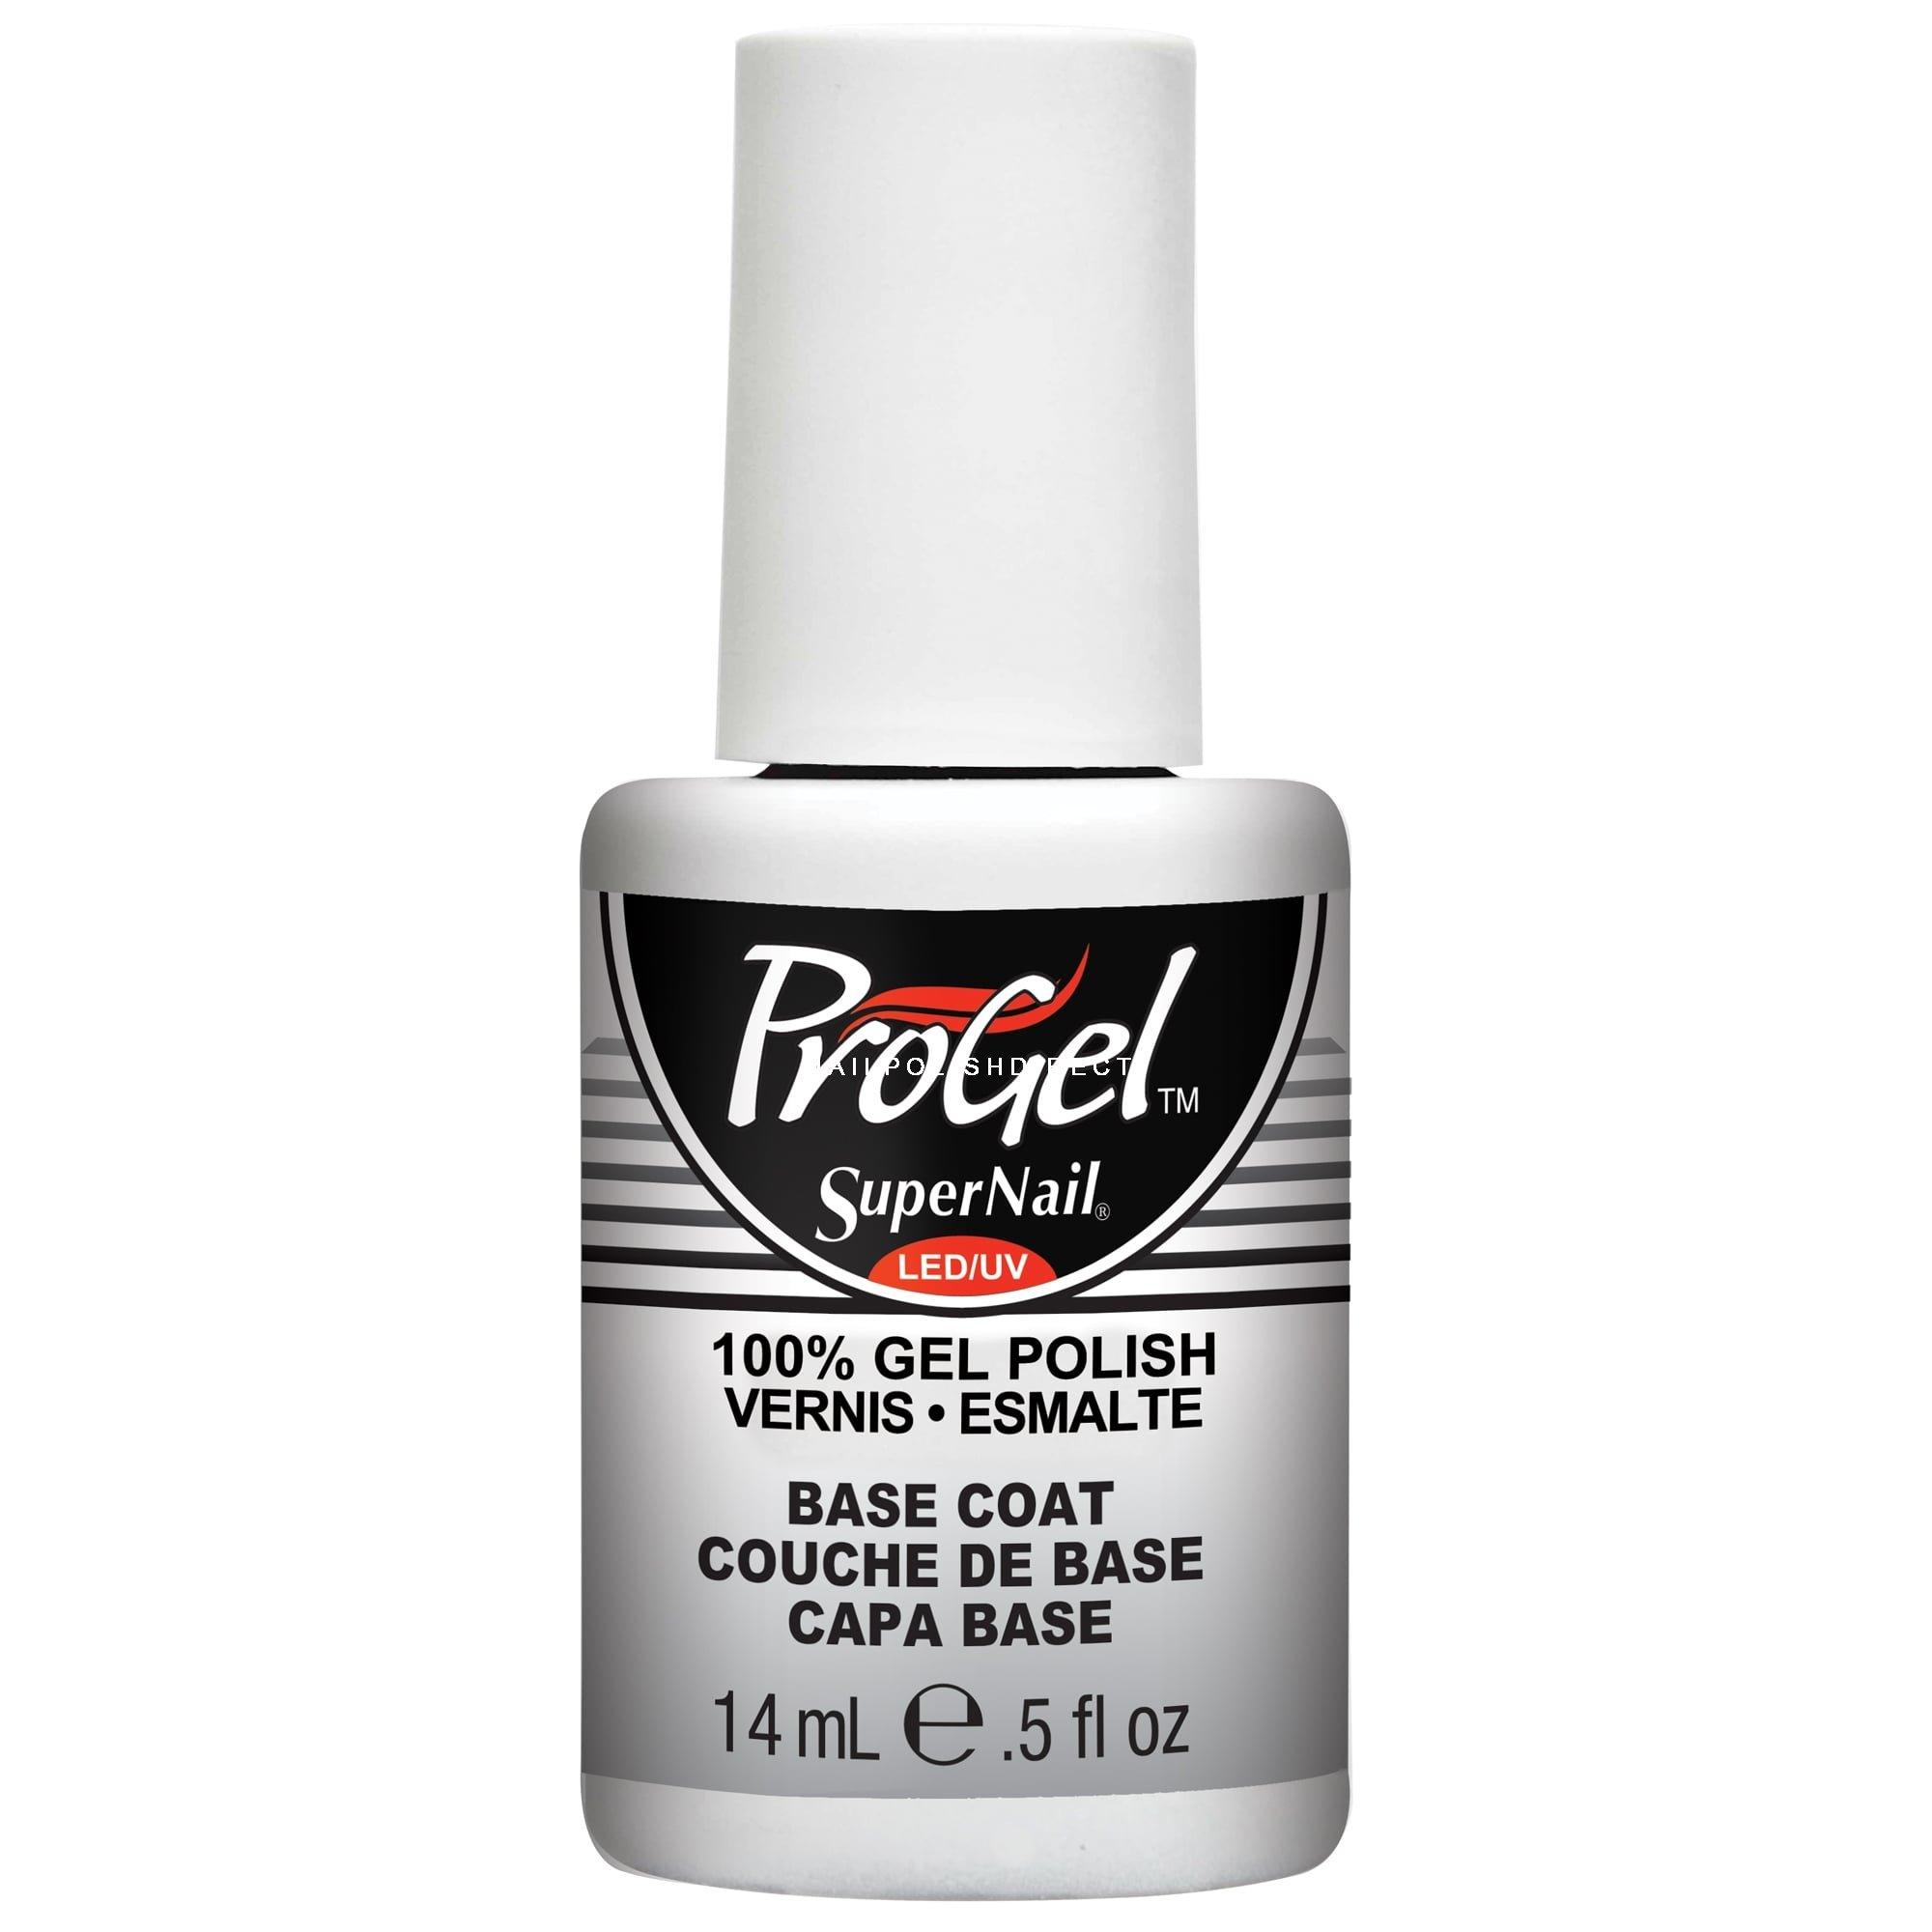 SuperNail ProGel Nail Treatment - Base Coat 14ml | Professional Nails